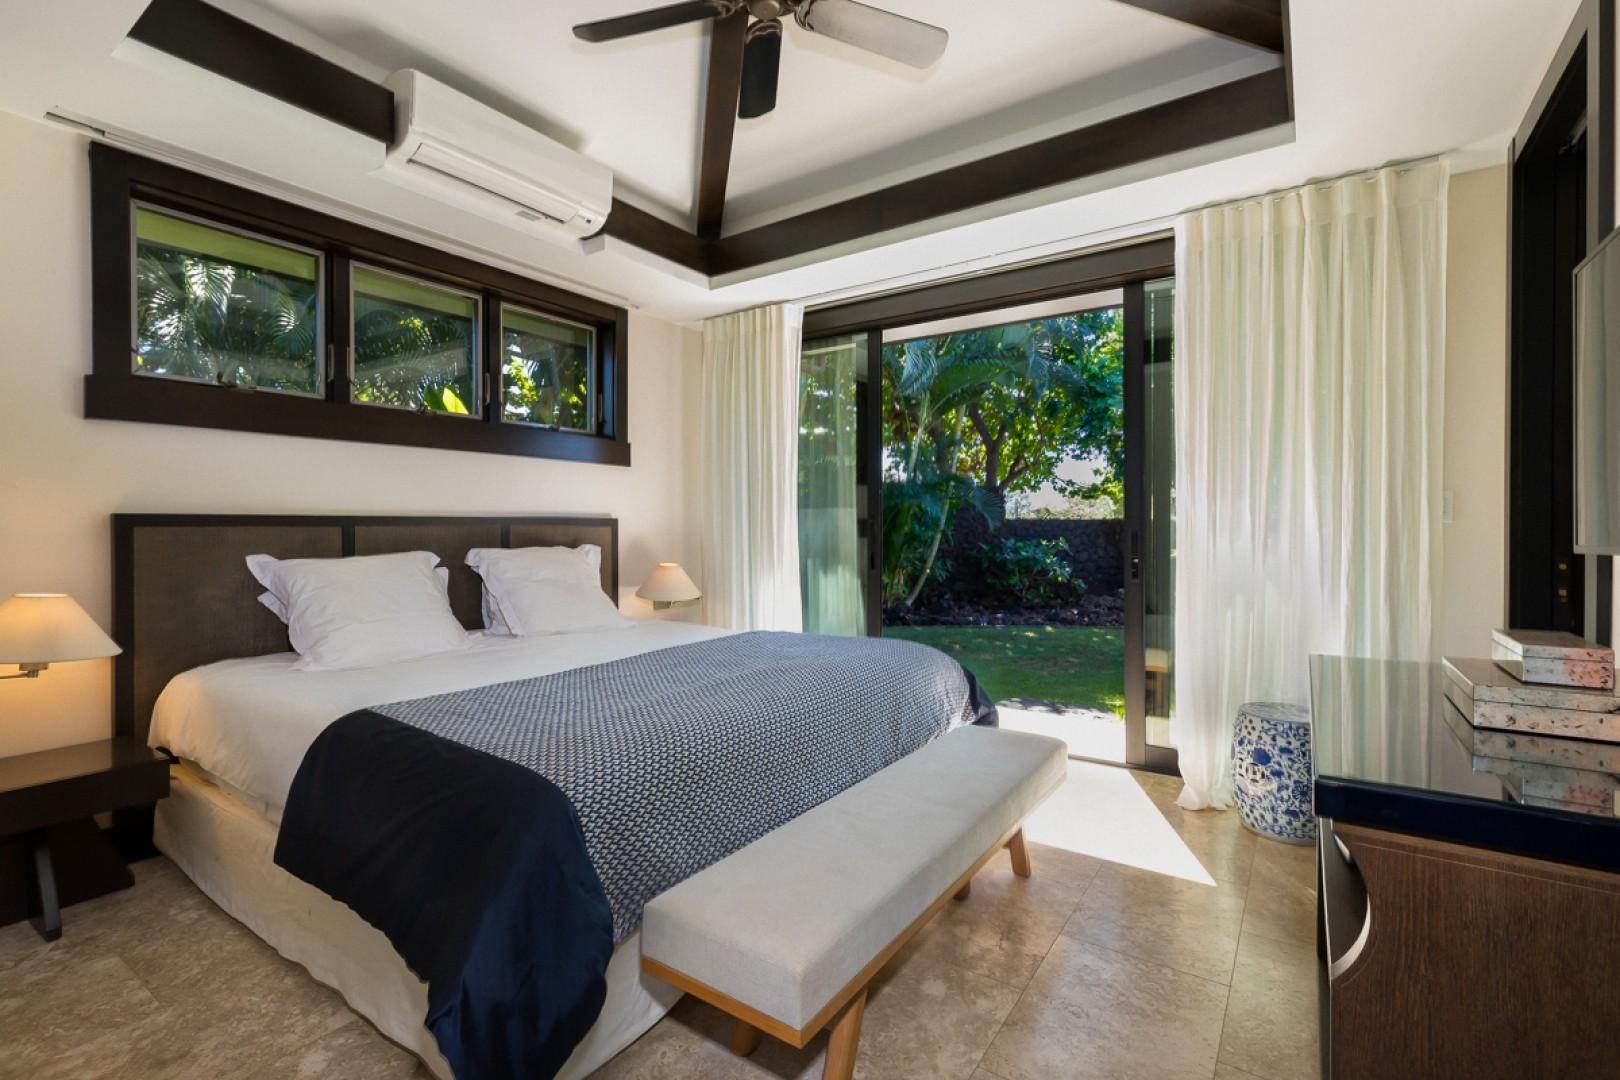 Elegant bedroom with lanai access